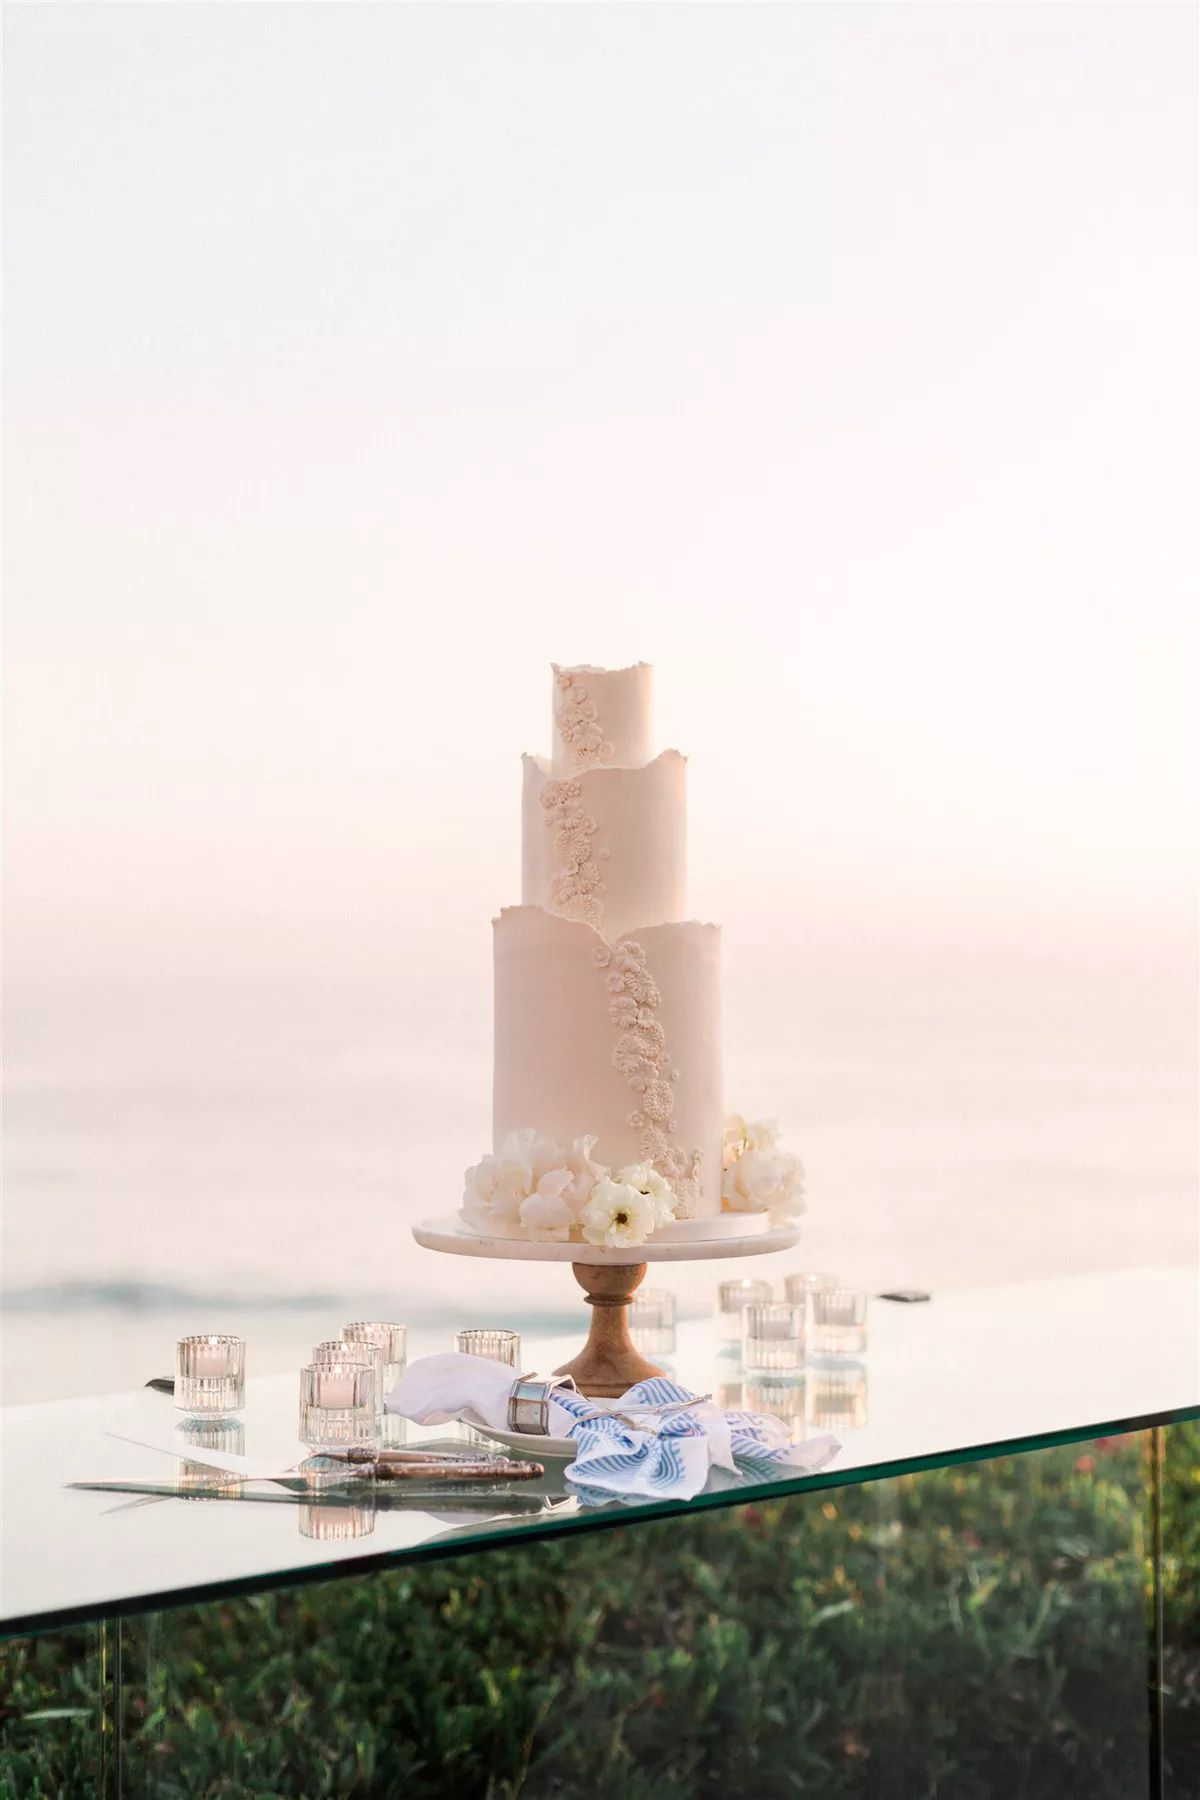 wedding cake on display by the ocean